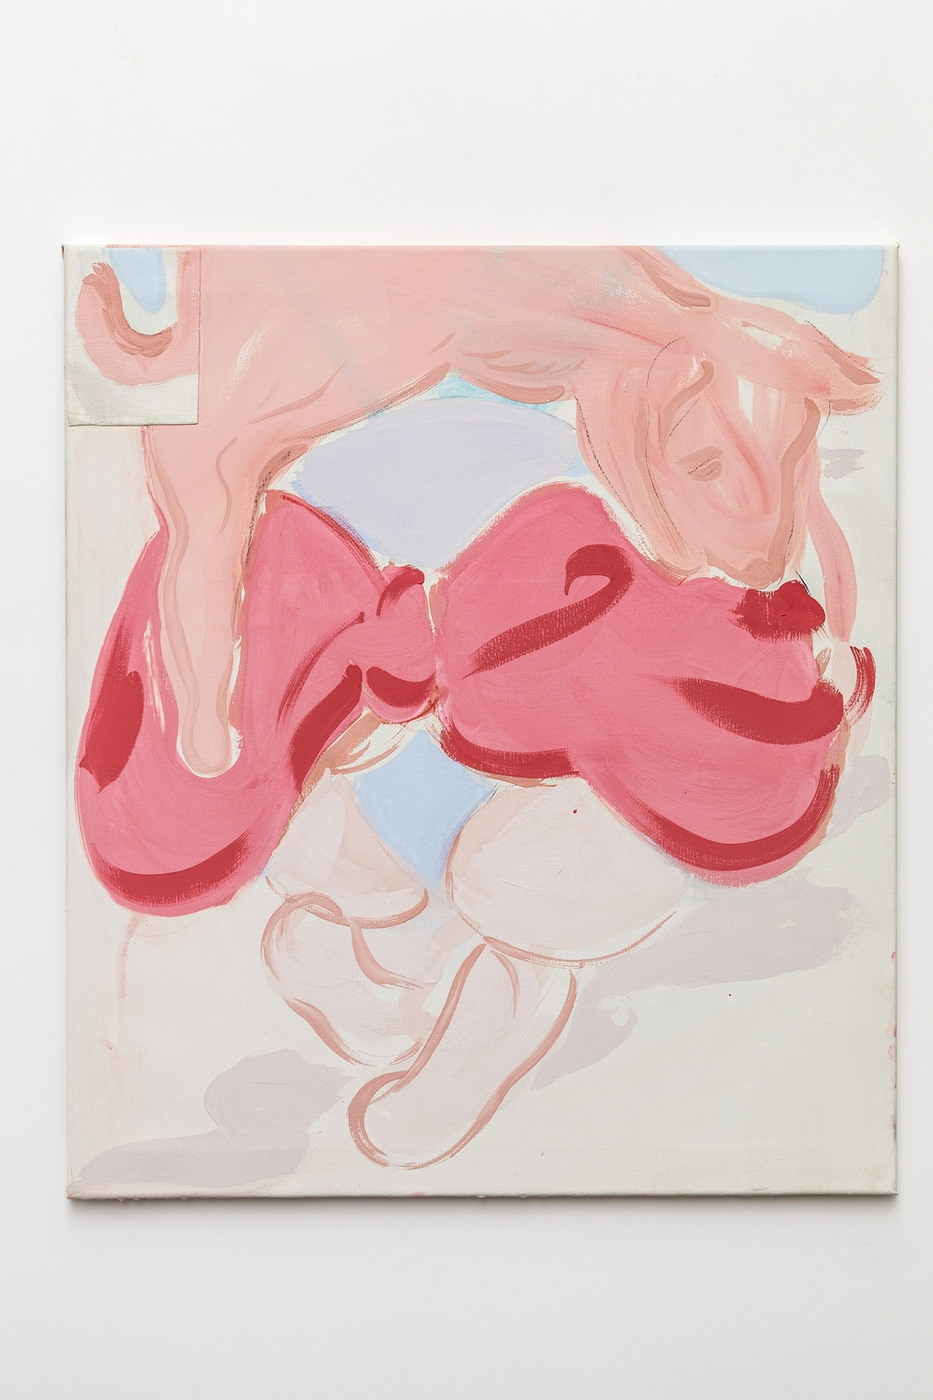 Grant Foster The Porc 2016, 80x70 cm